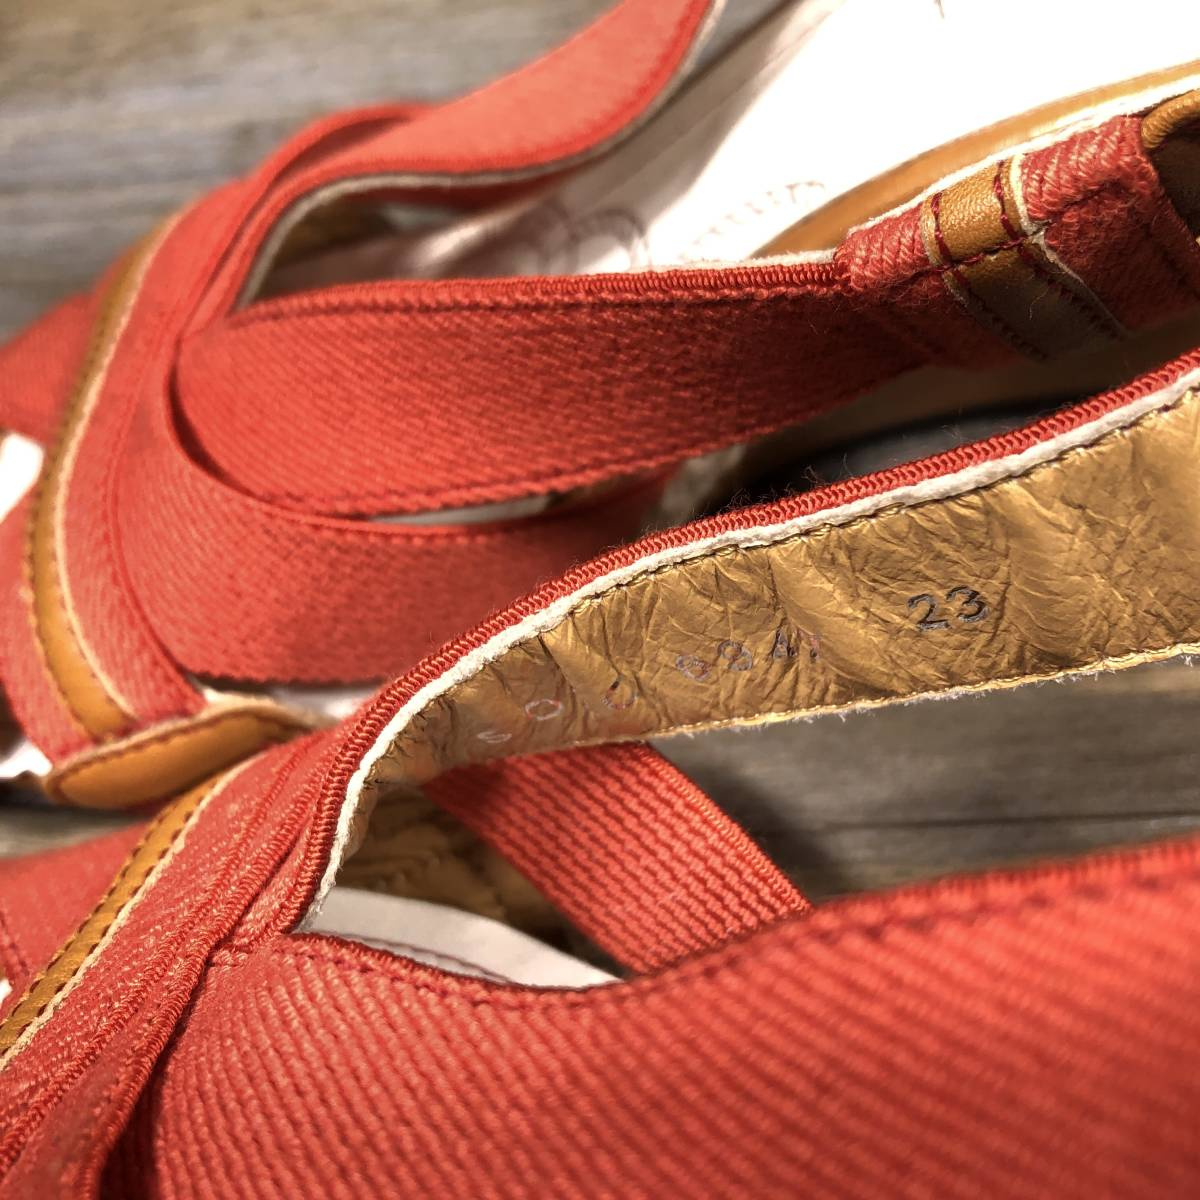 ■REGAL■ 23cm オレンジ リーガル サンダル レディース ウェッジソール 靴 くつ 中古 宅急便 即決_画像8